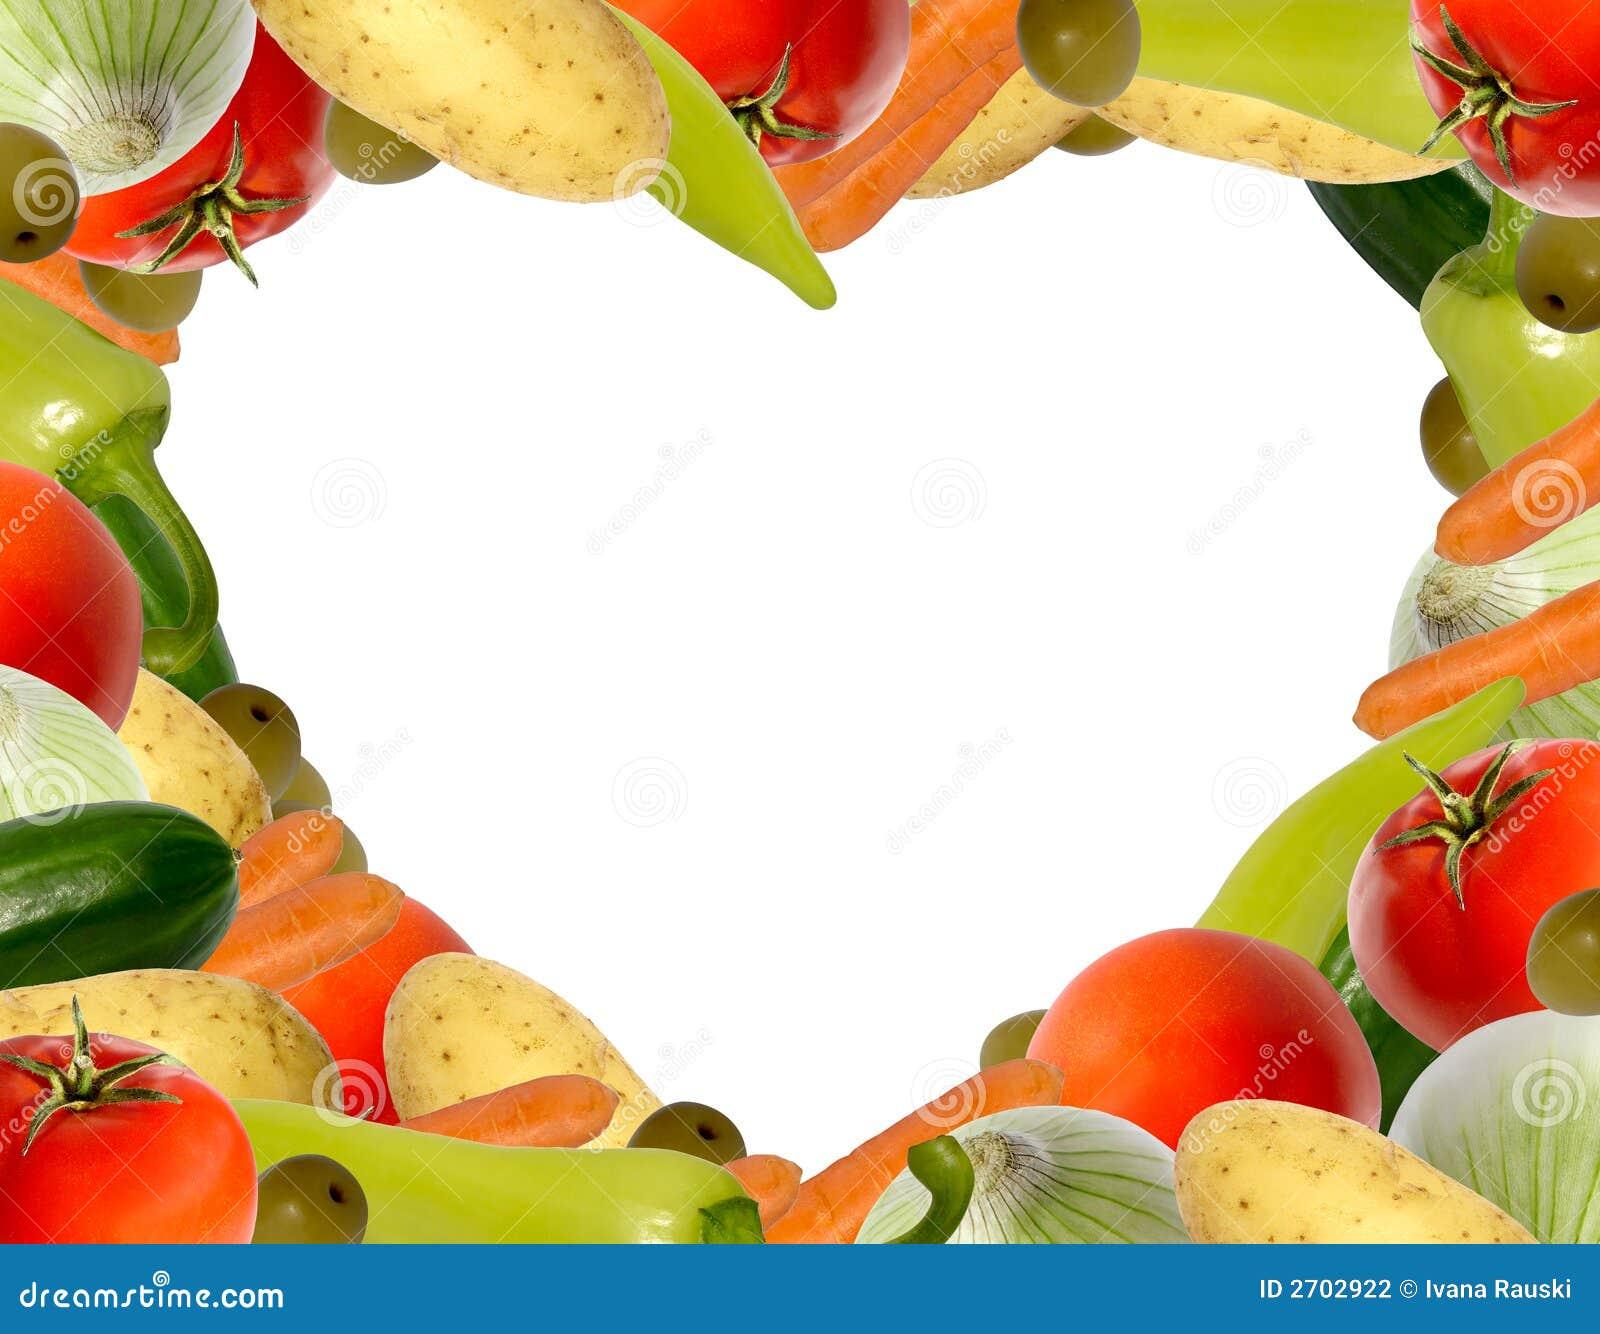 vegetable heartshaped frame stock photo image 2702922